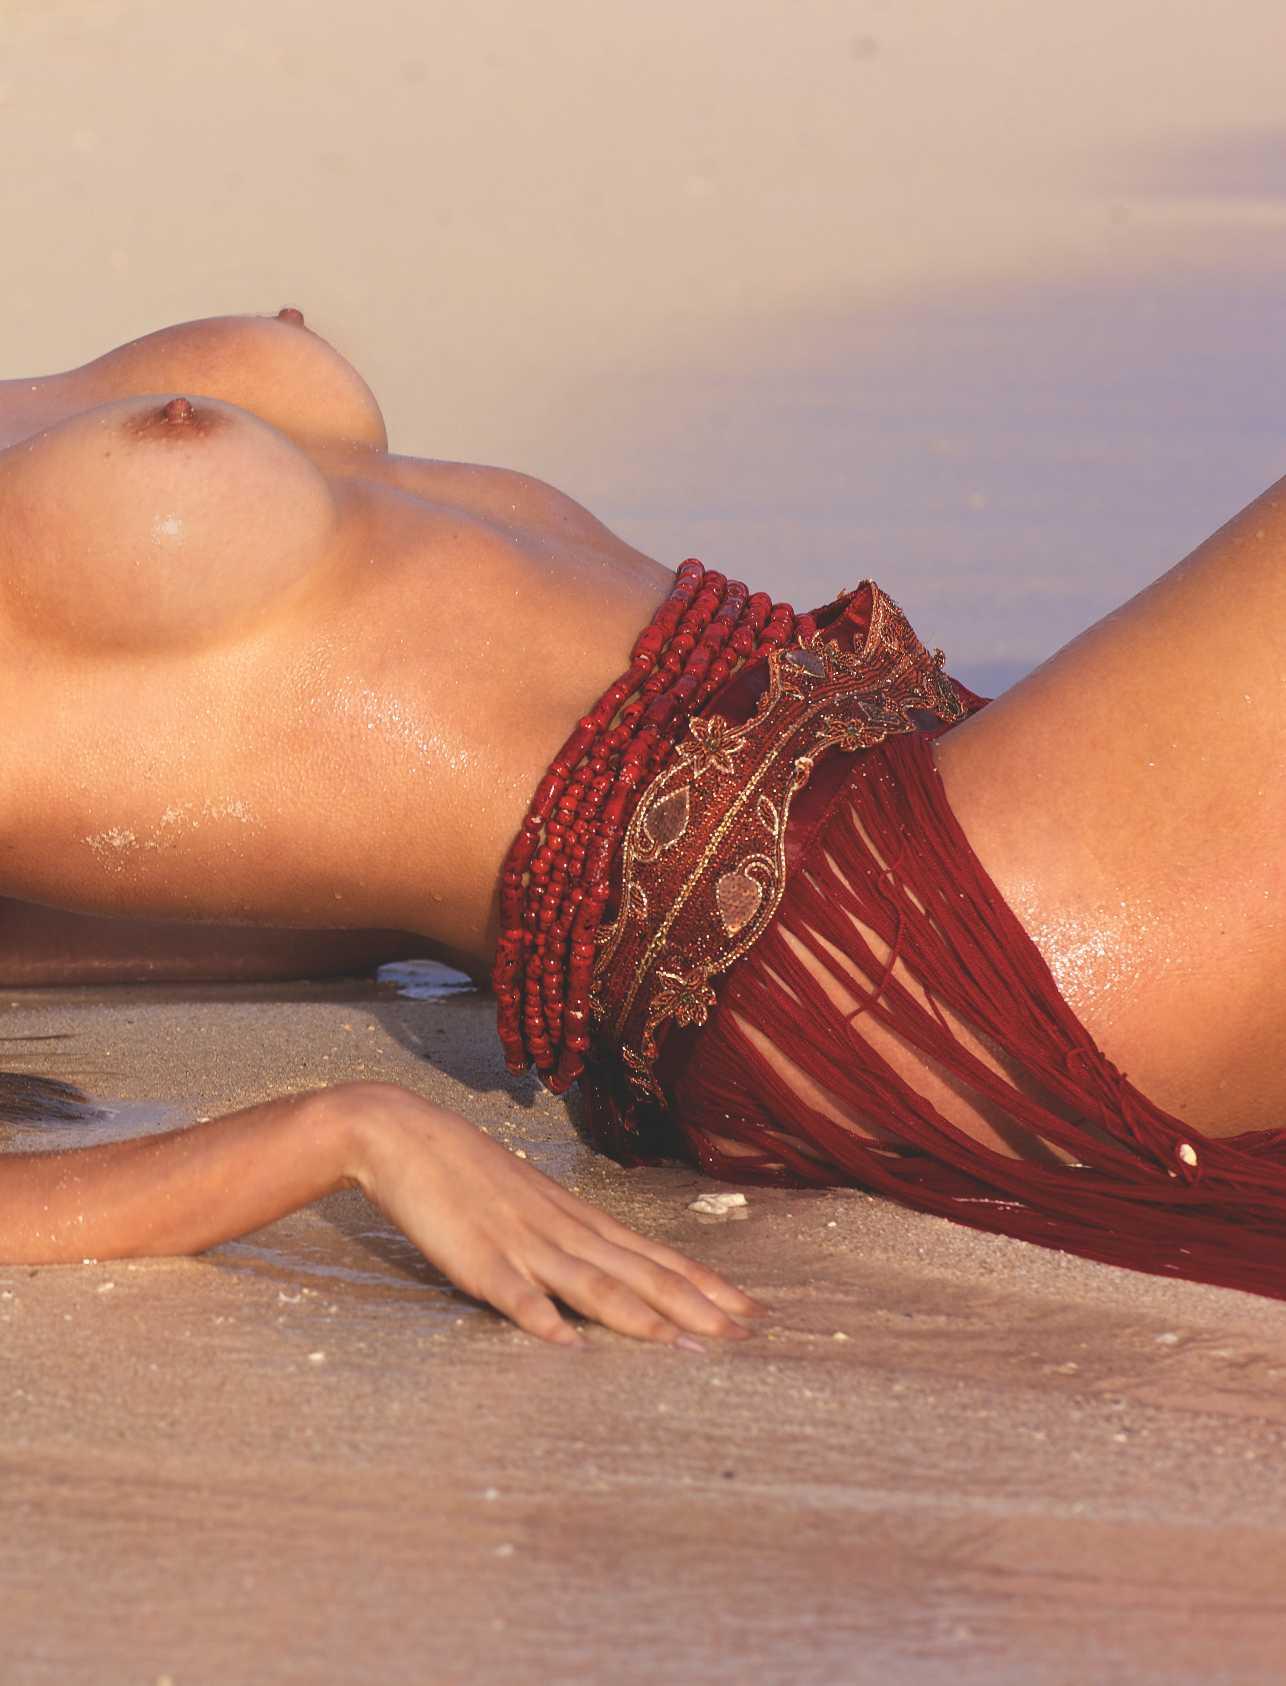 22733_septimiu29_RosannaDavison_PlayboyGermany_Oct20123_123_507lo.jpg